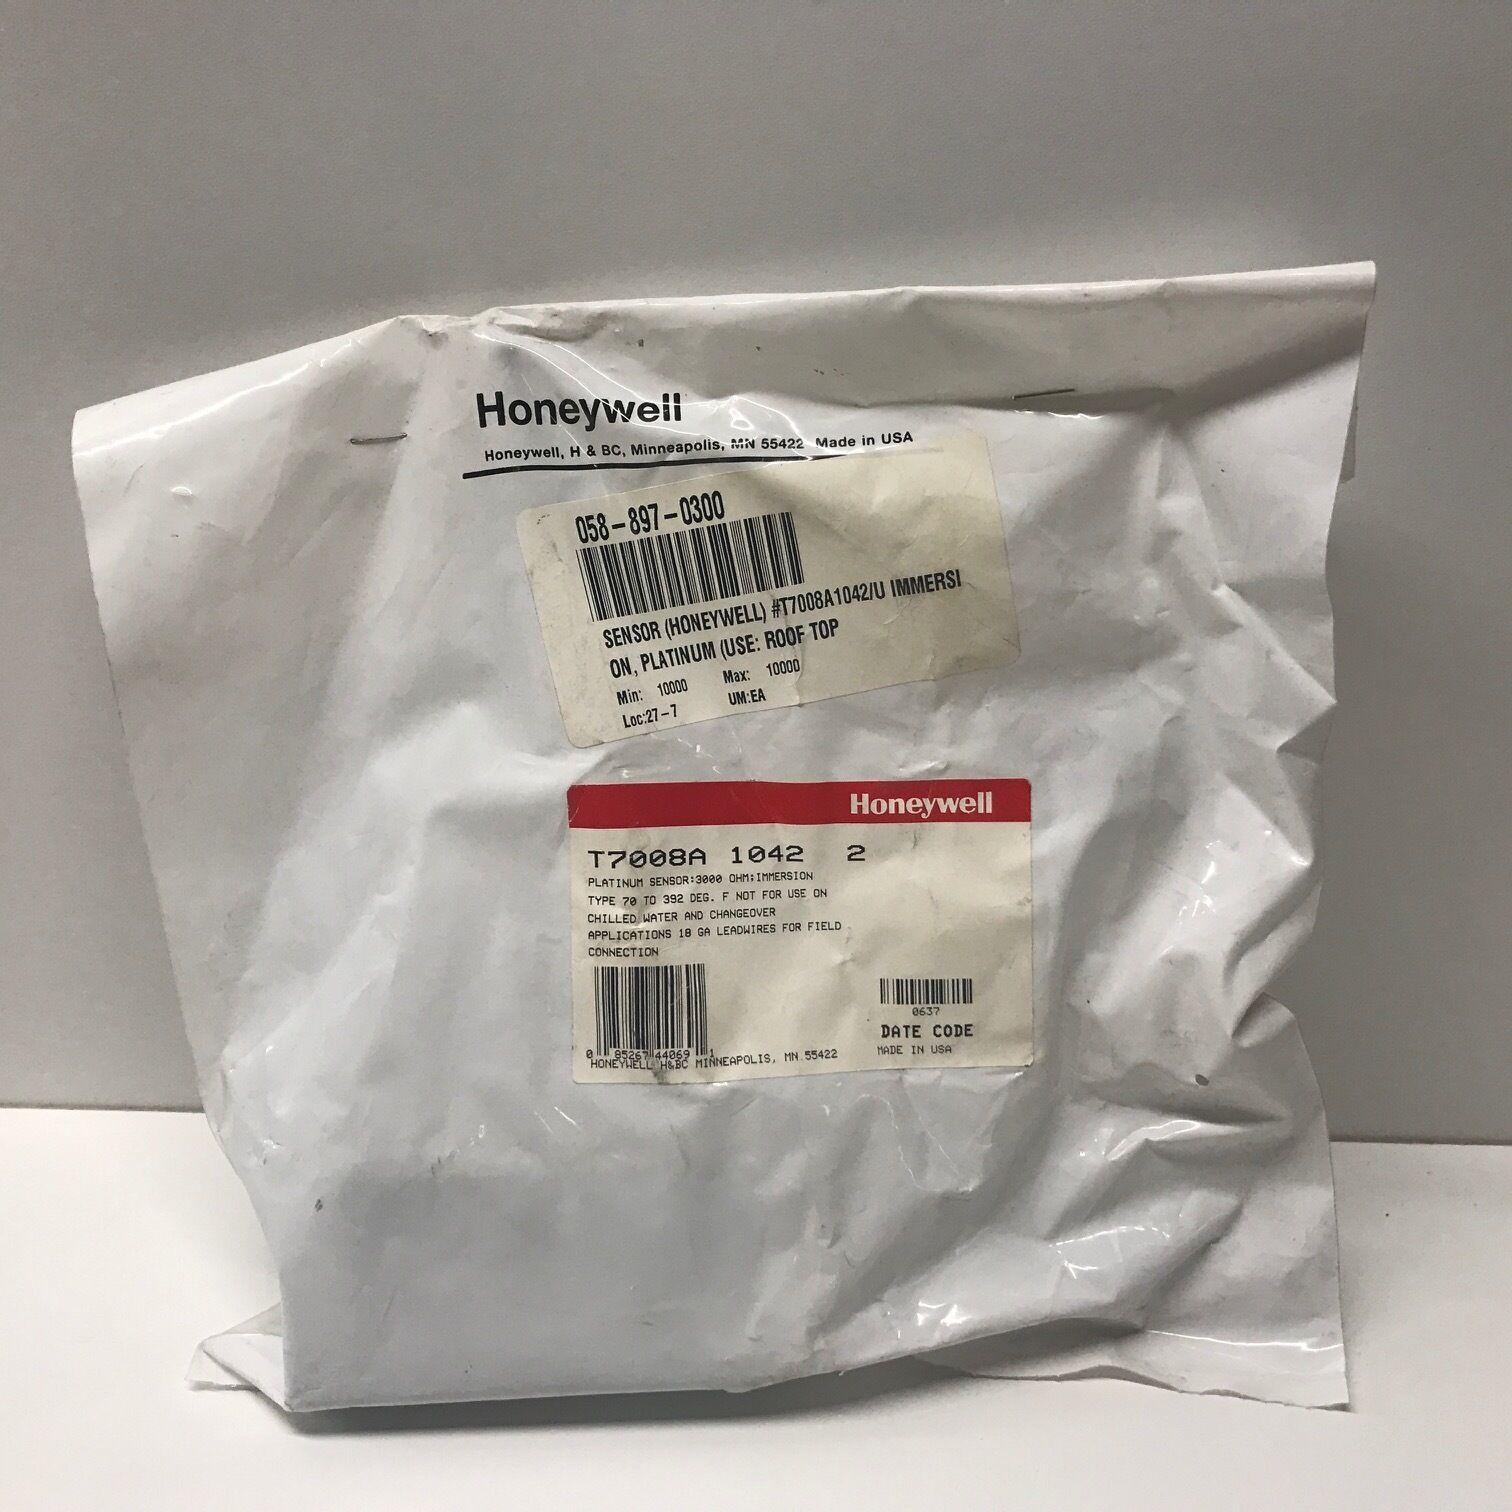 Honeywell T7008A 1026 Platinum Immersion Sensor 20-392F 21141